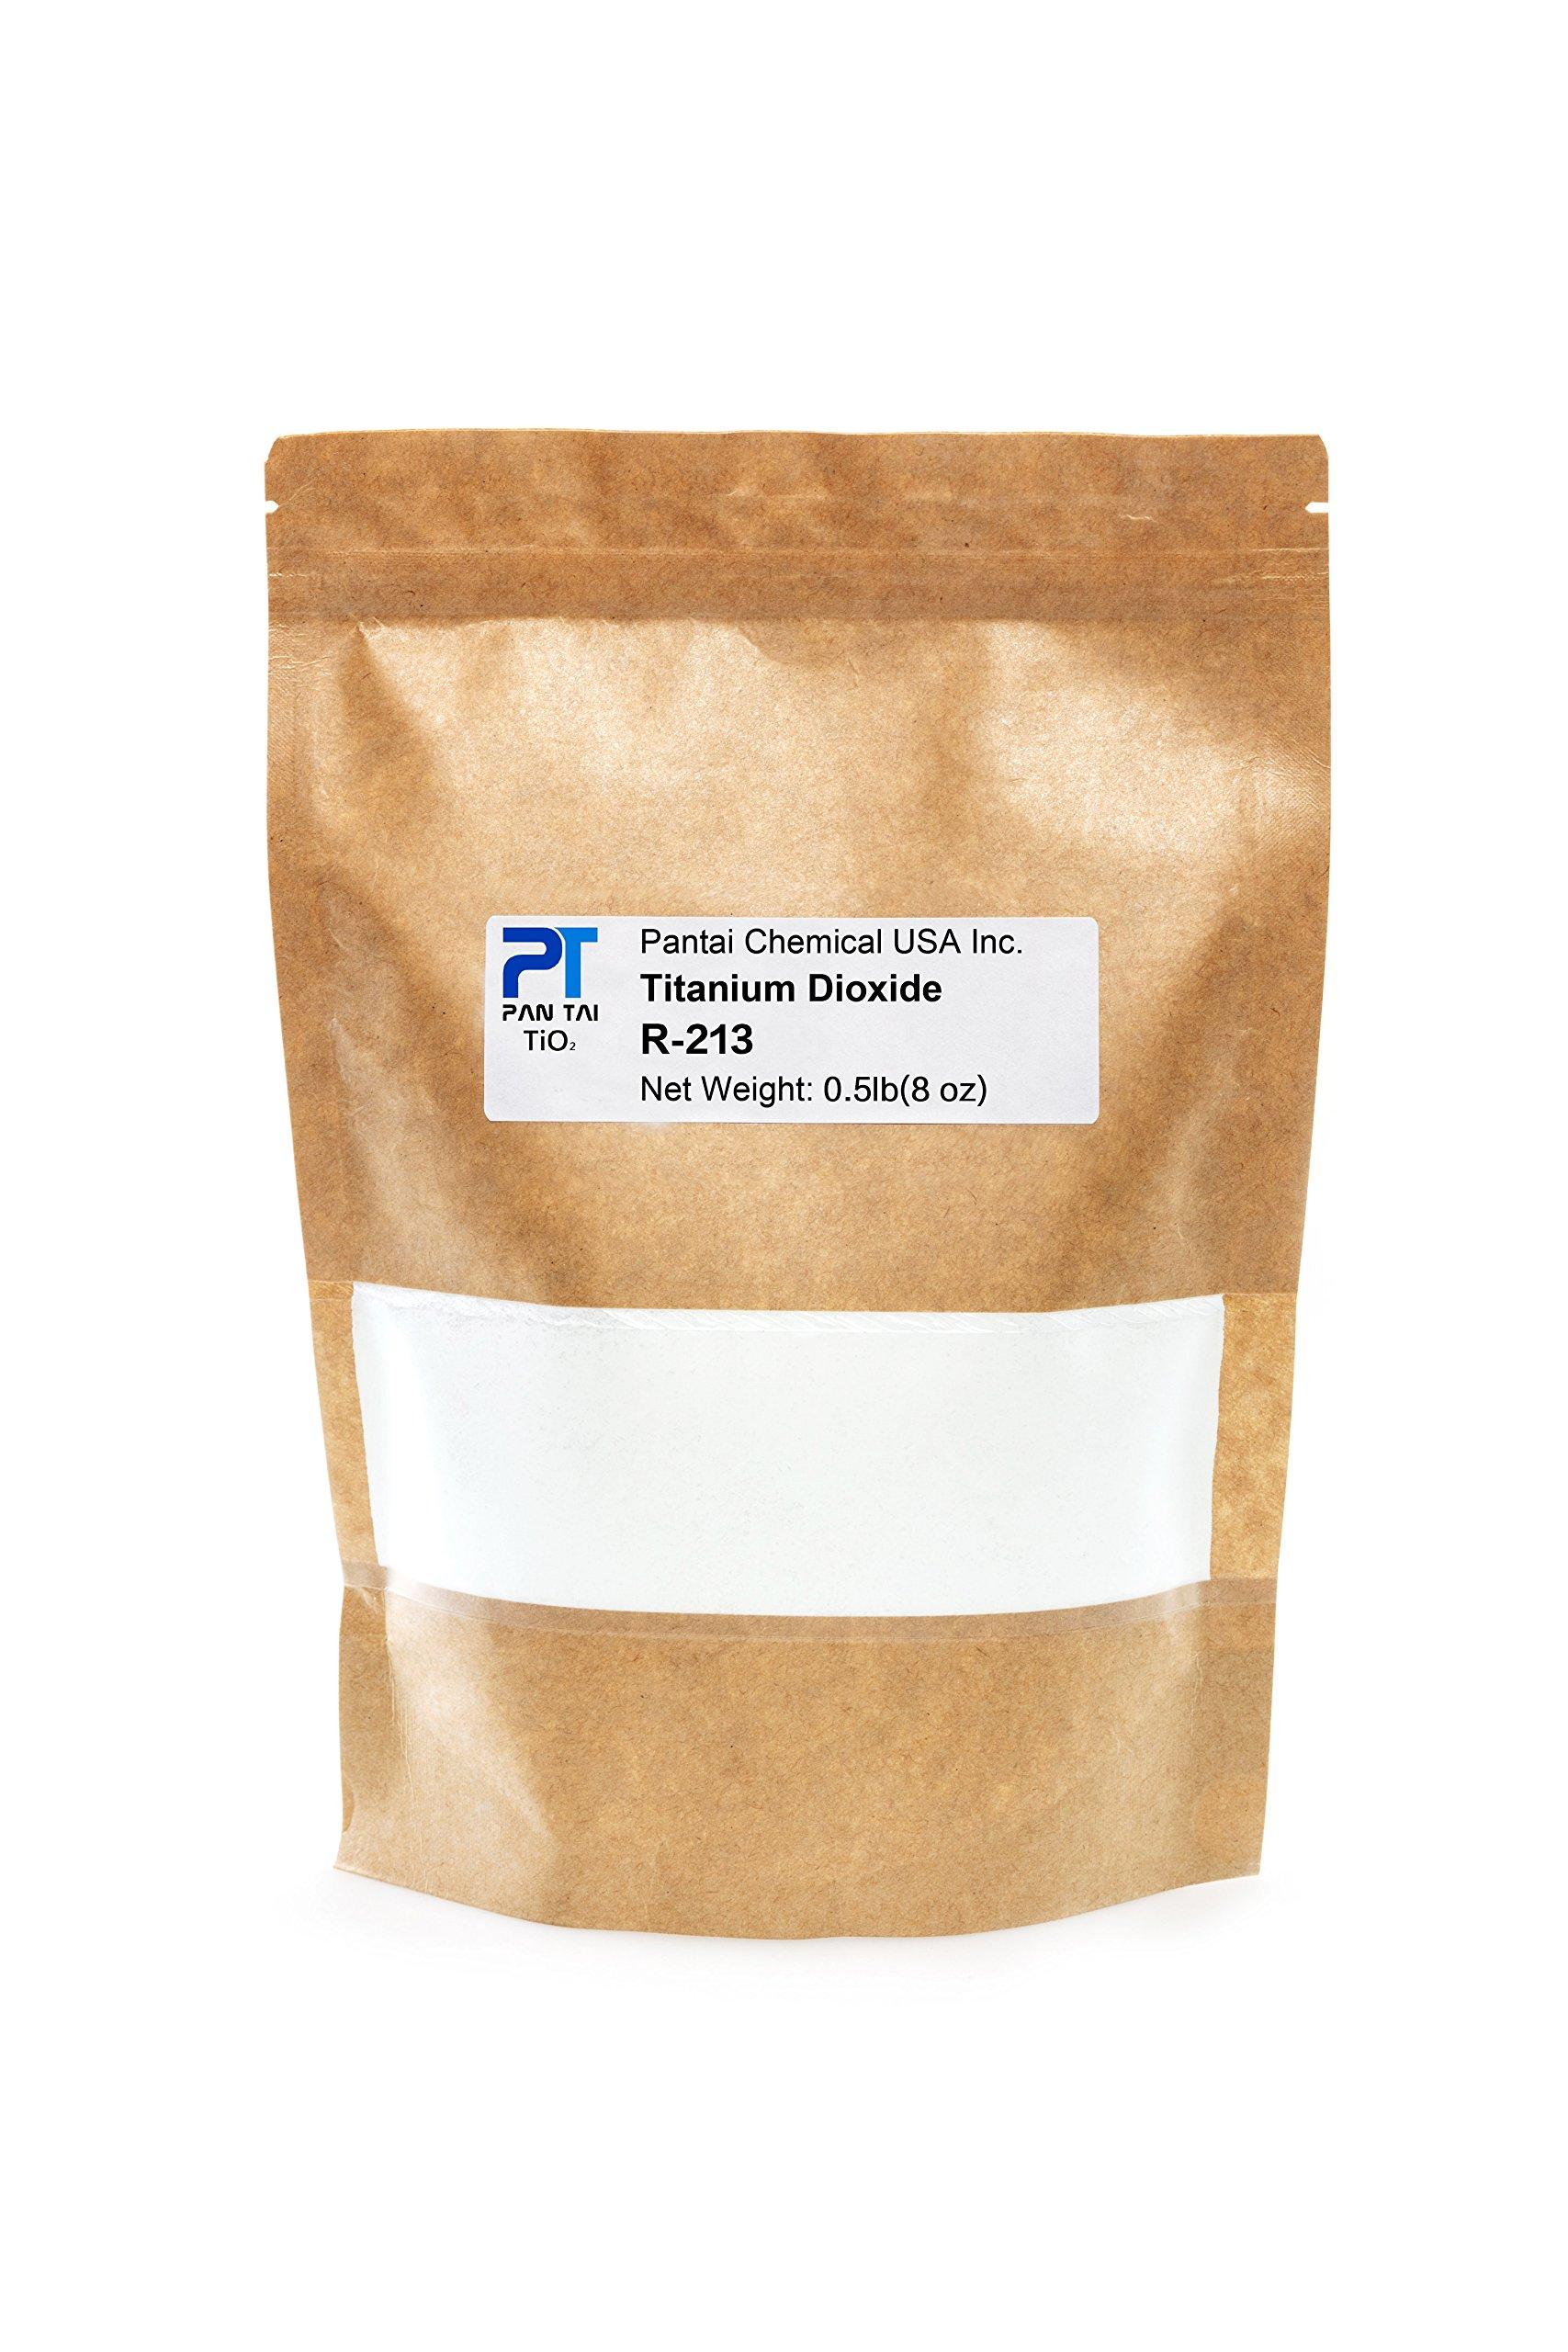 Pure Fine Titanium Dioxide (TiO2) Food-Grade Safe Colorant | Pigment, Toothpaste, Edible Use | Vegan Friendly, Non-GMO | Resealable Bag (R-213) 16oz/8oz/4oz (8oz/0.5lb)